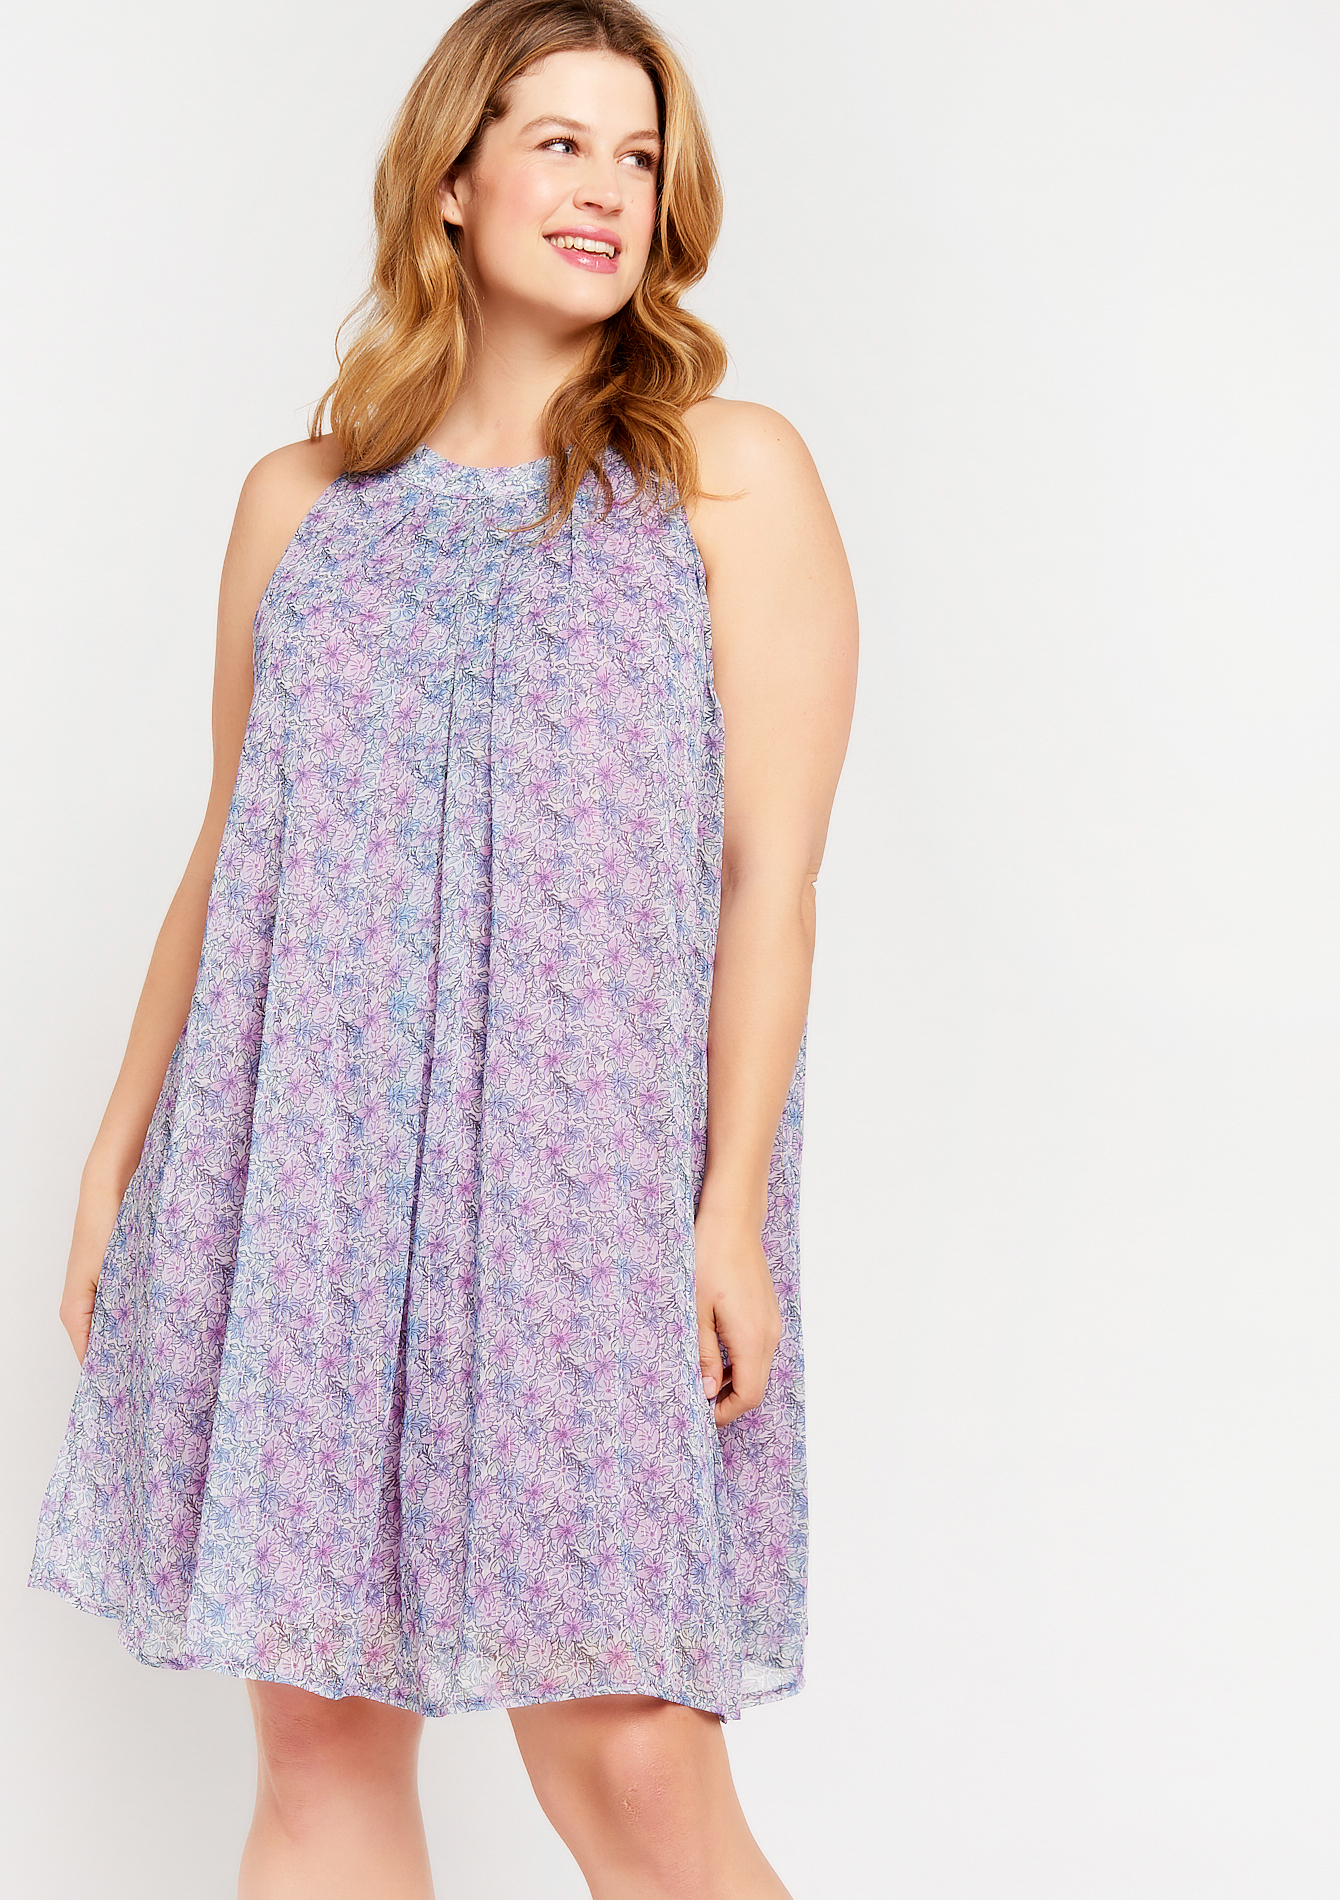 Robe ample à imprimé liberty - LolaLiza - Modalova